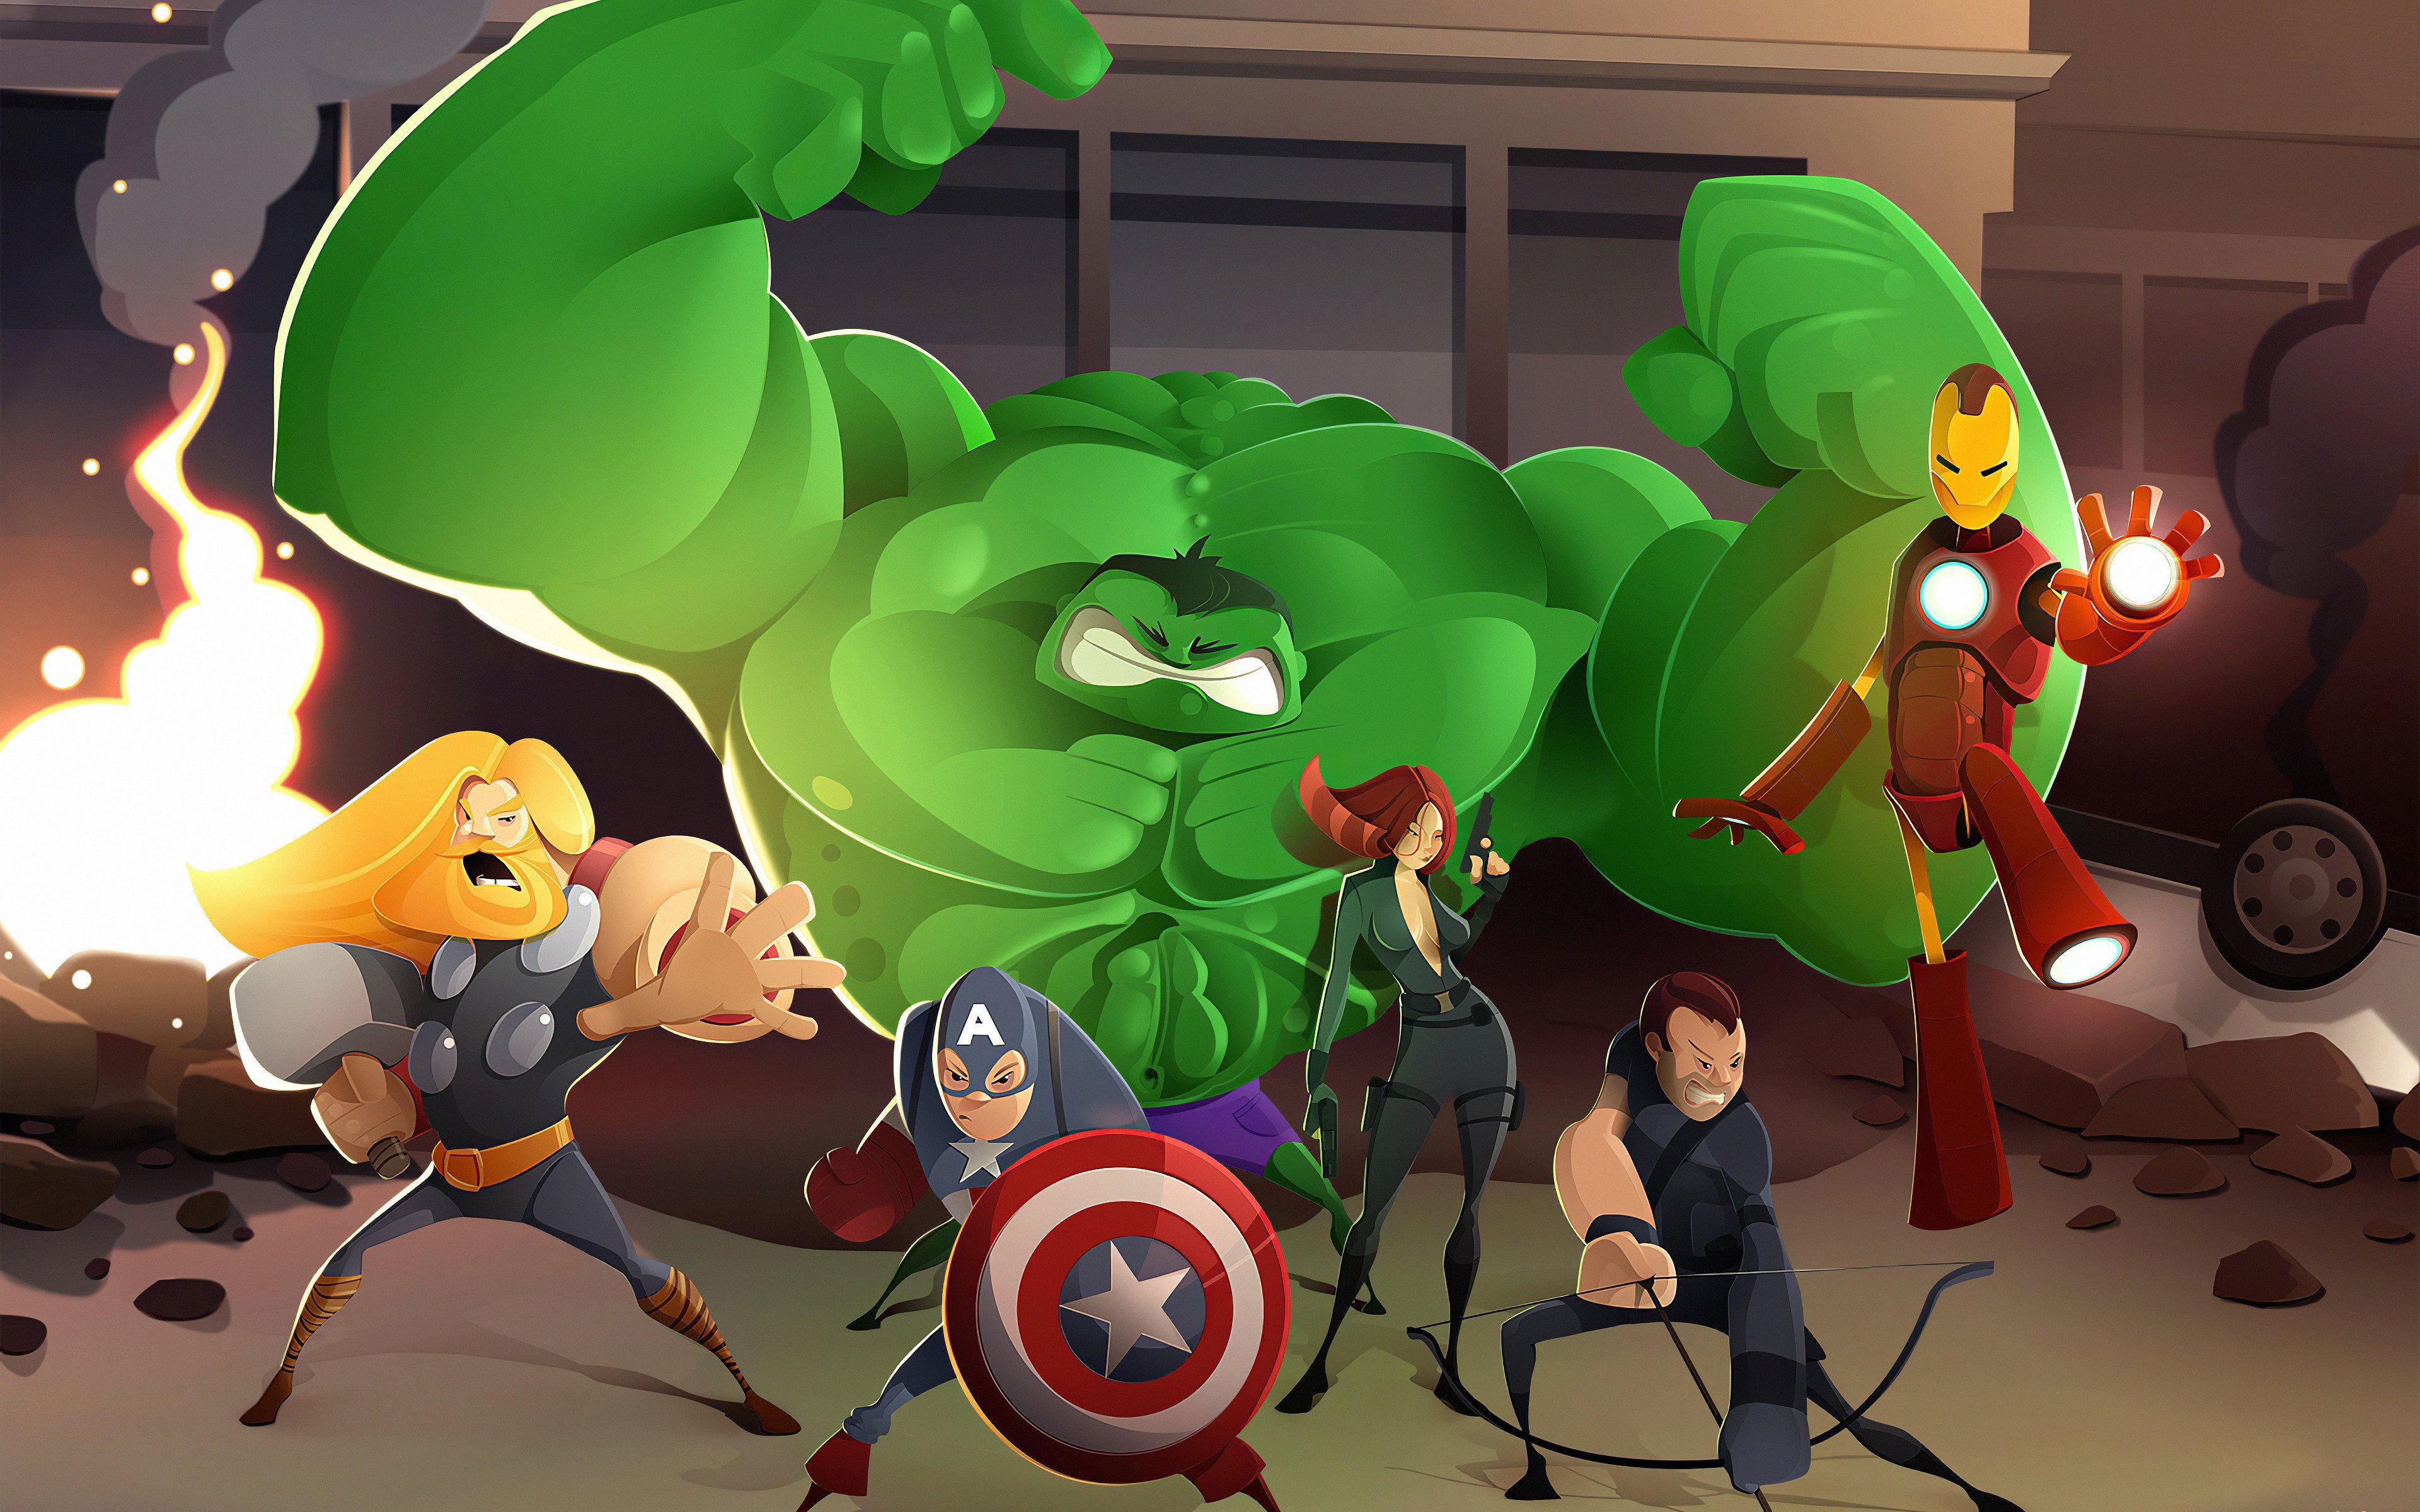 Wallpaper Cartoon of The Avengers